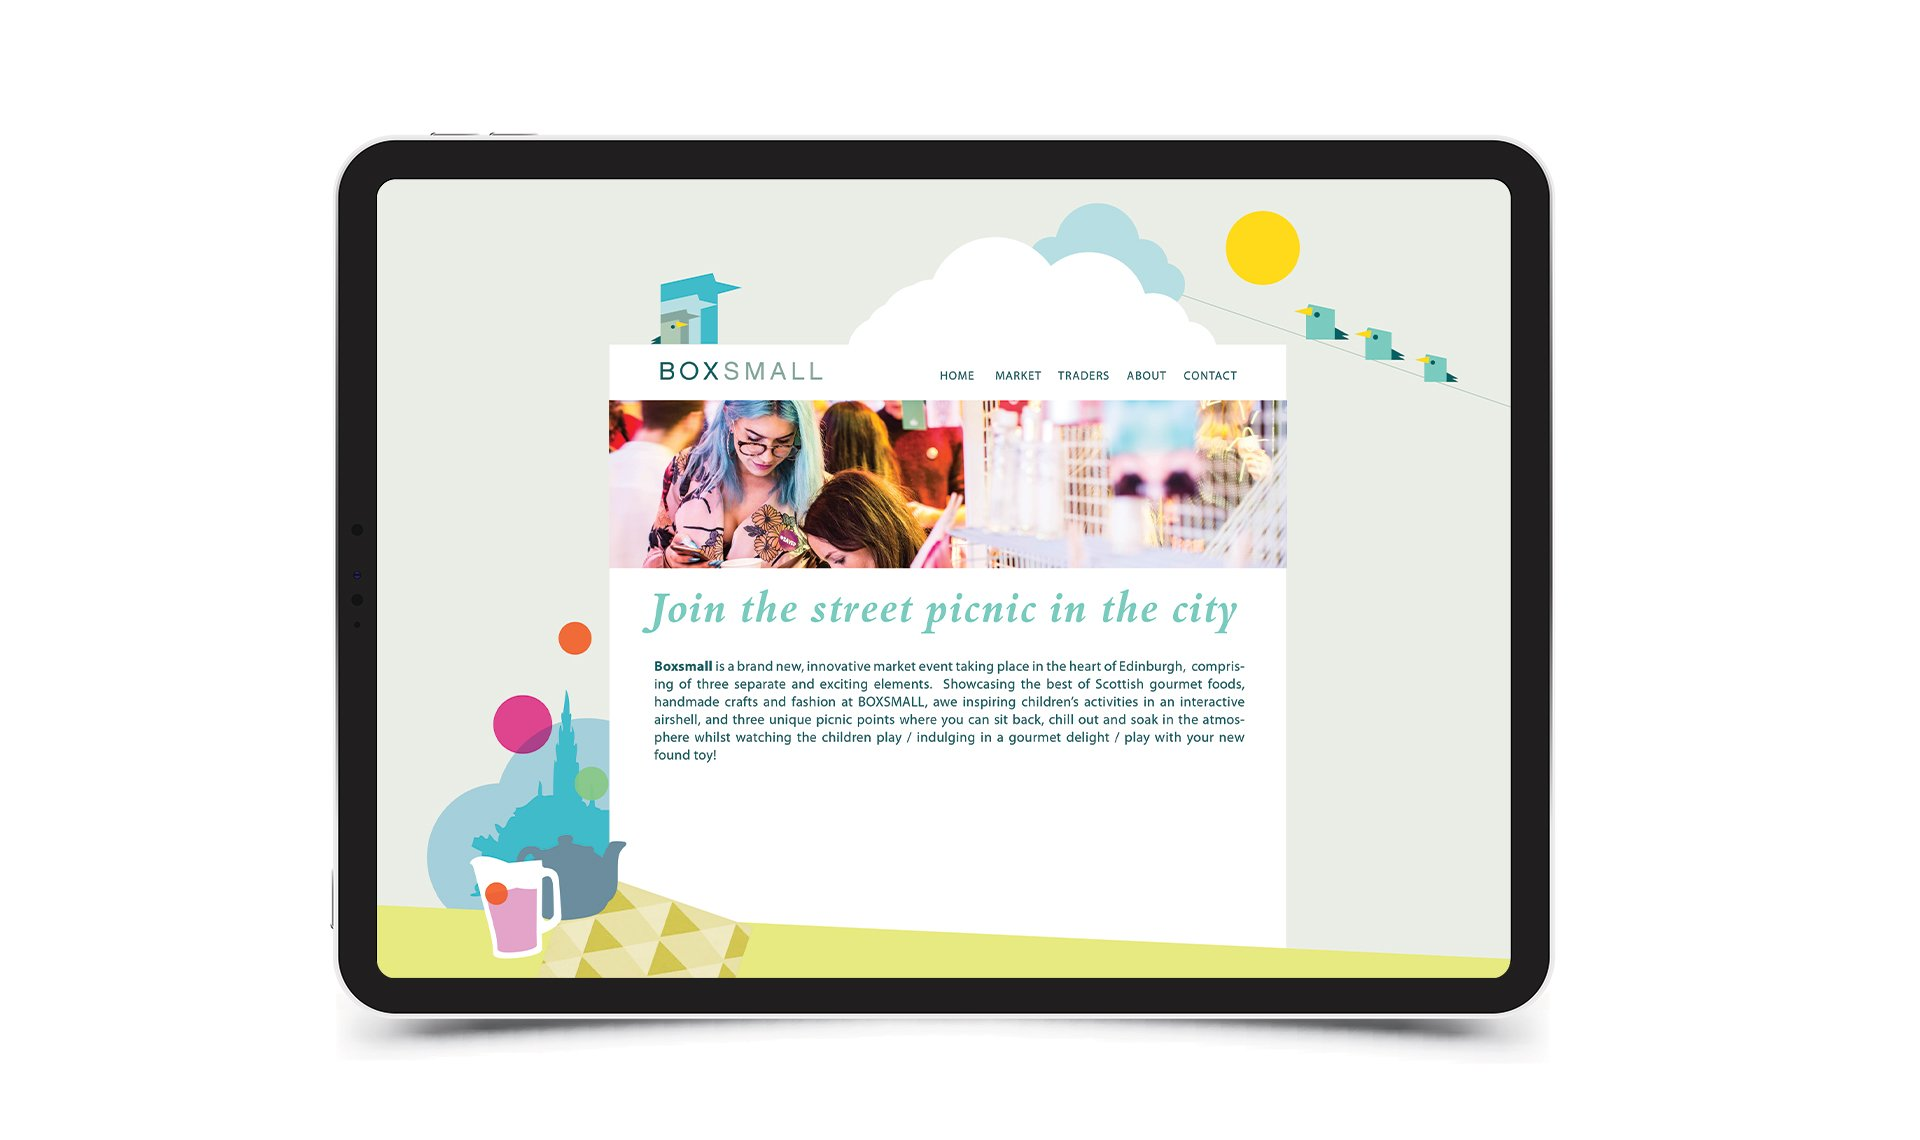 BoxSmall website viewed on an iPad